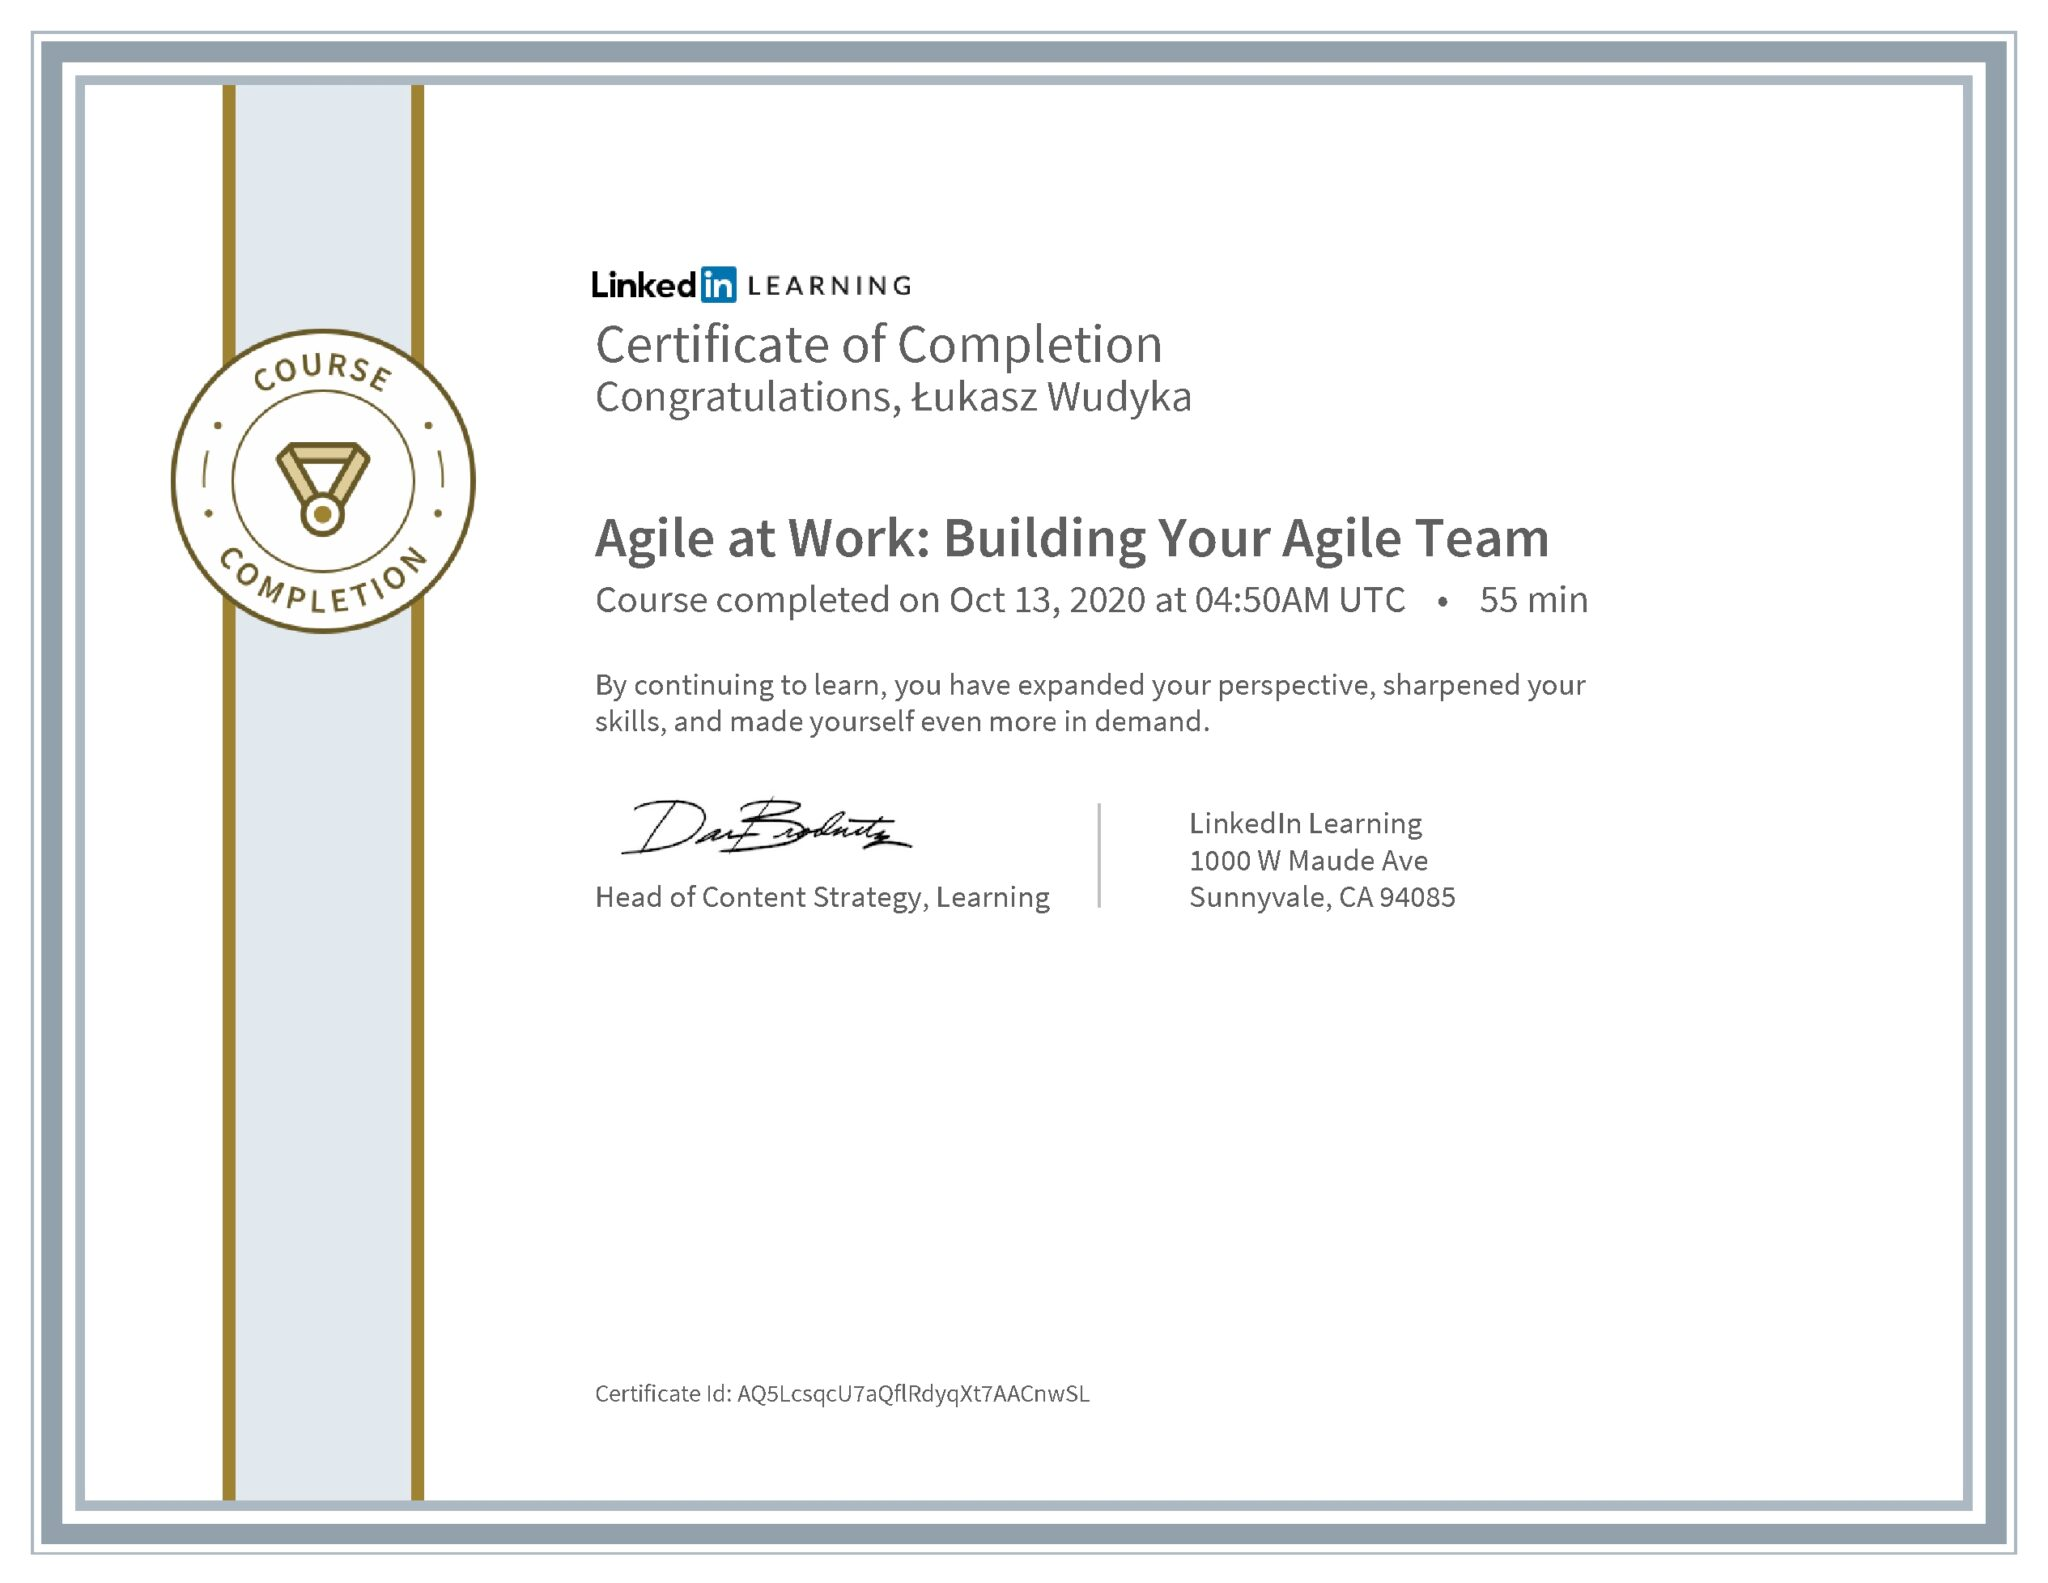 Łukasz Wudyka certyfikat LinkedIn Agile at Work: Building Your Agile Team